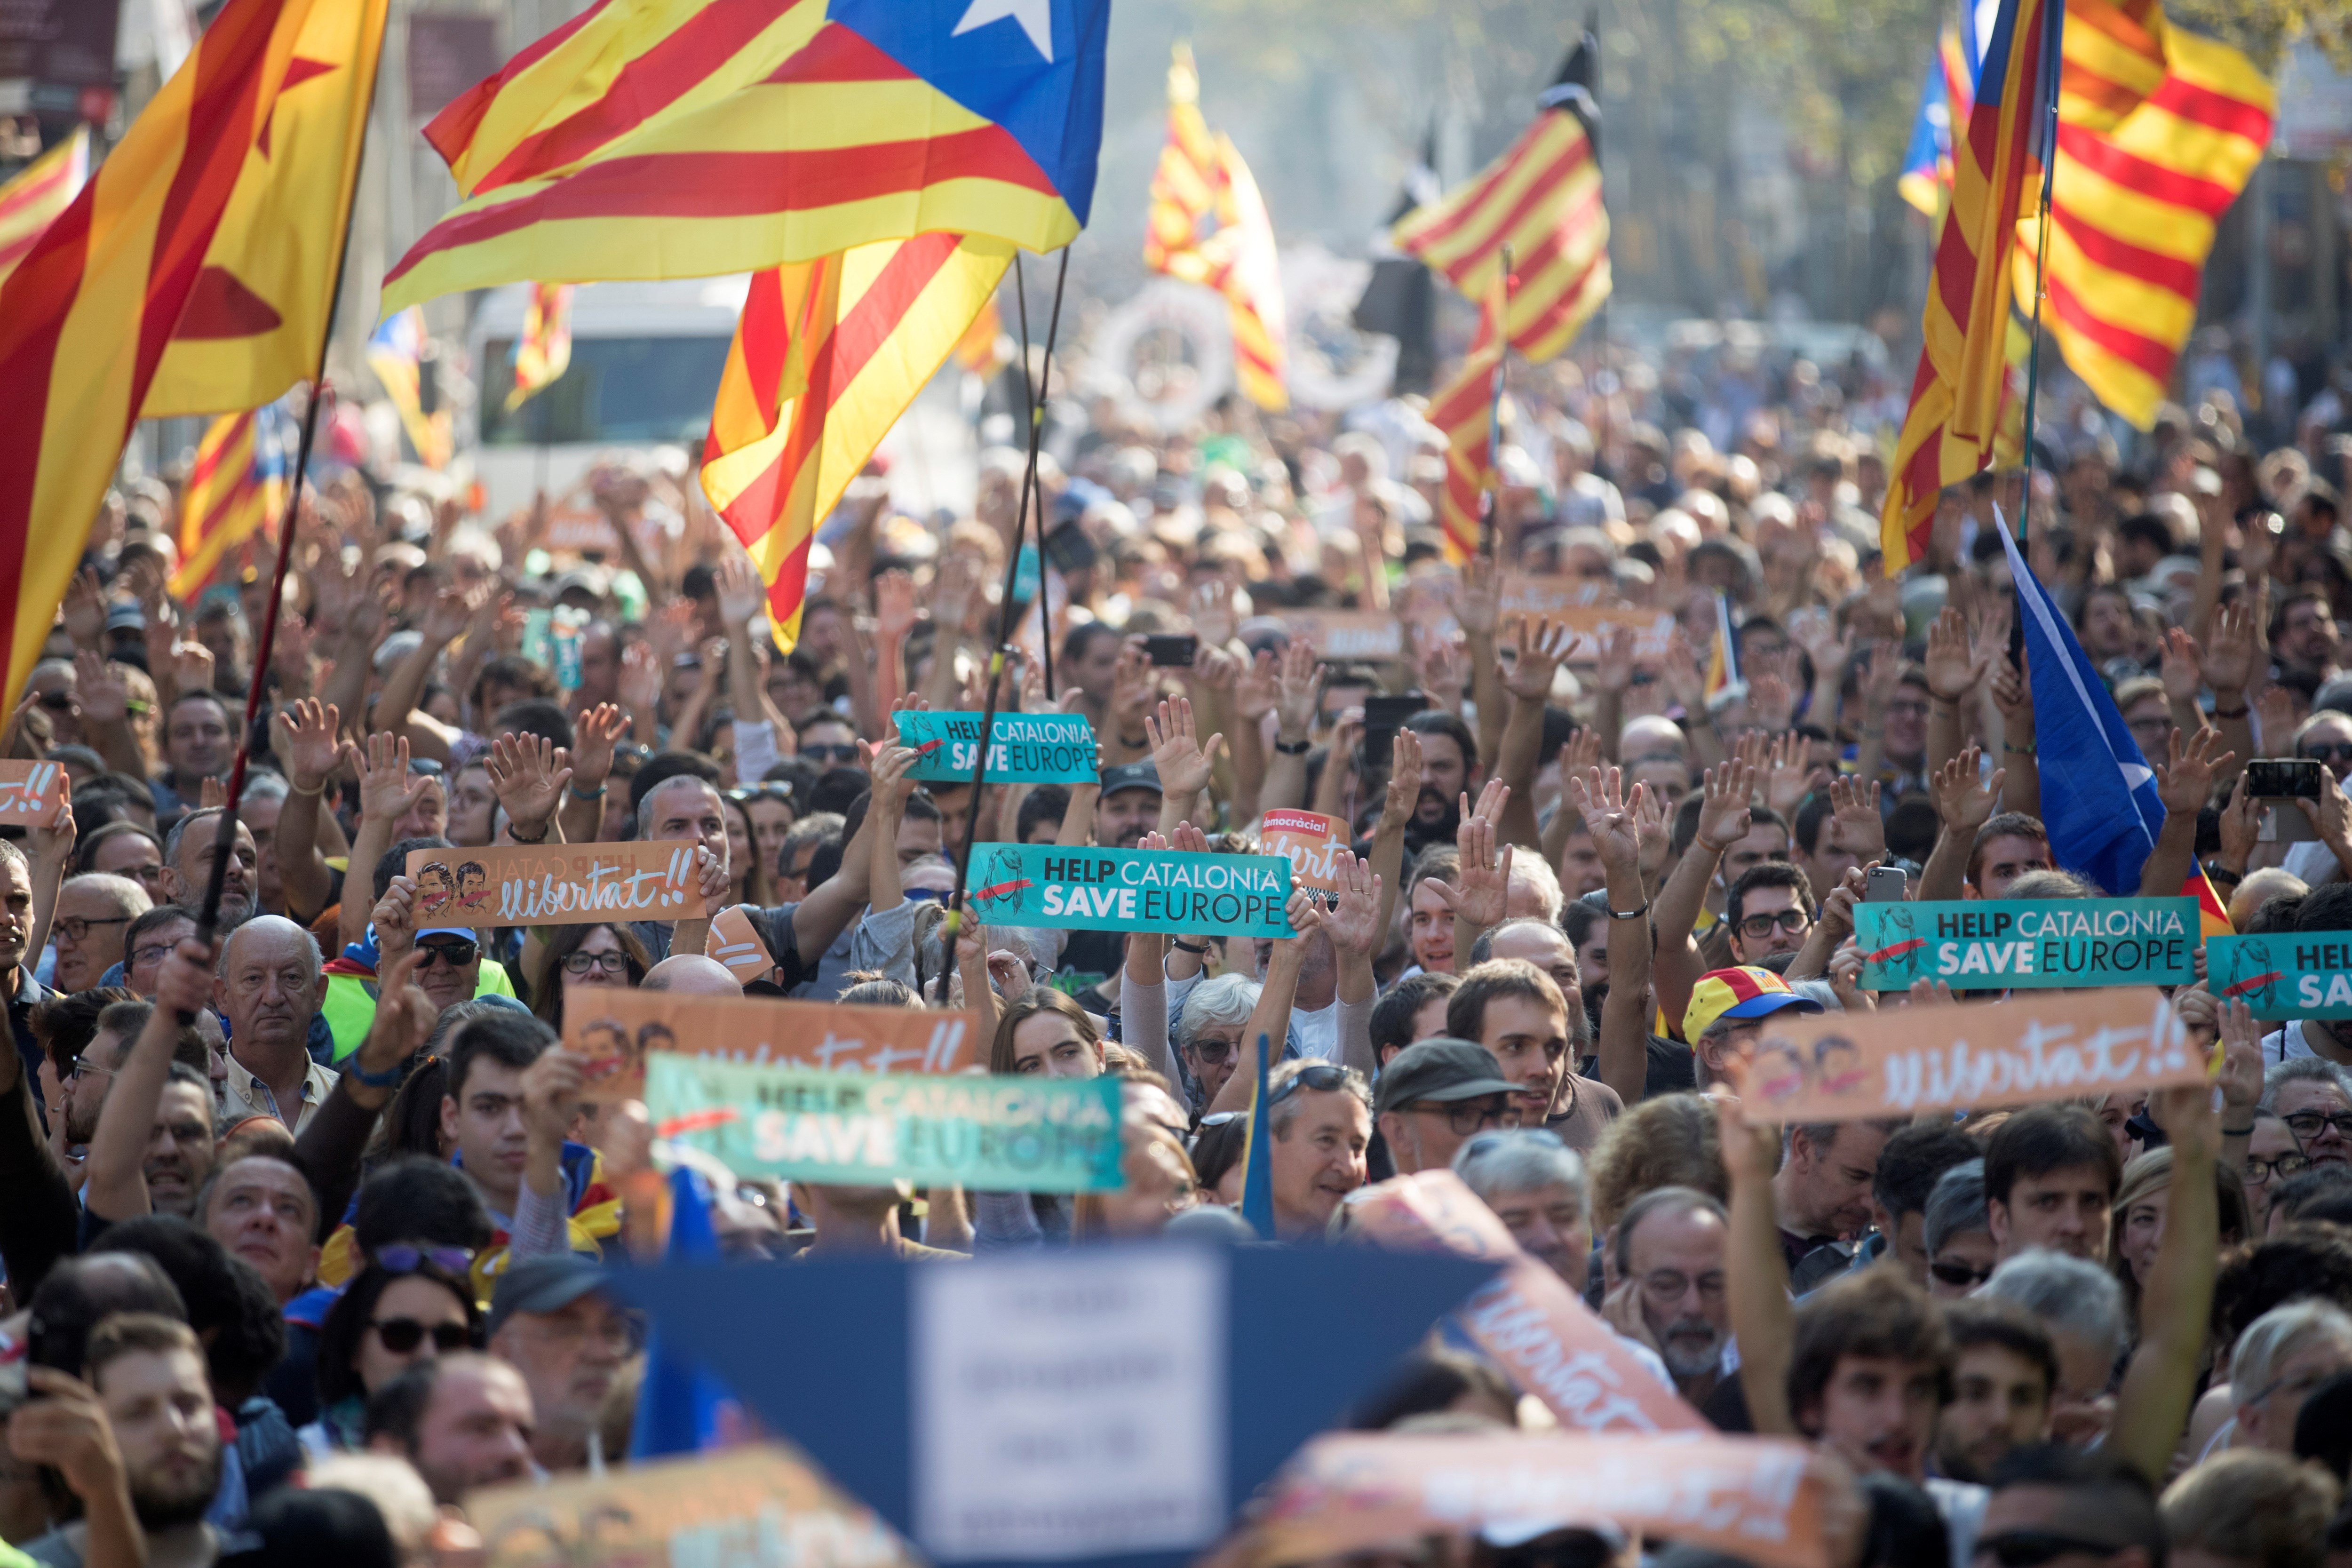 Unes 12.000 persones, segons la Guàrdia Urbana, estan concentrades davant del parc de la Ciutadella. /EFE